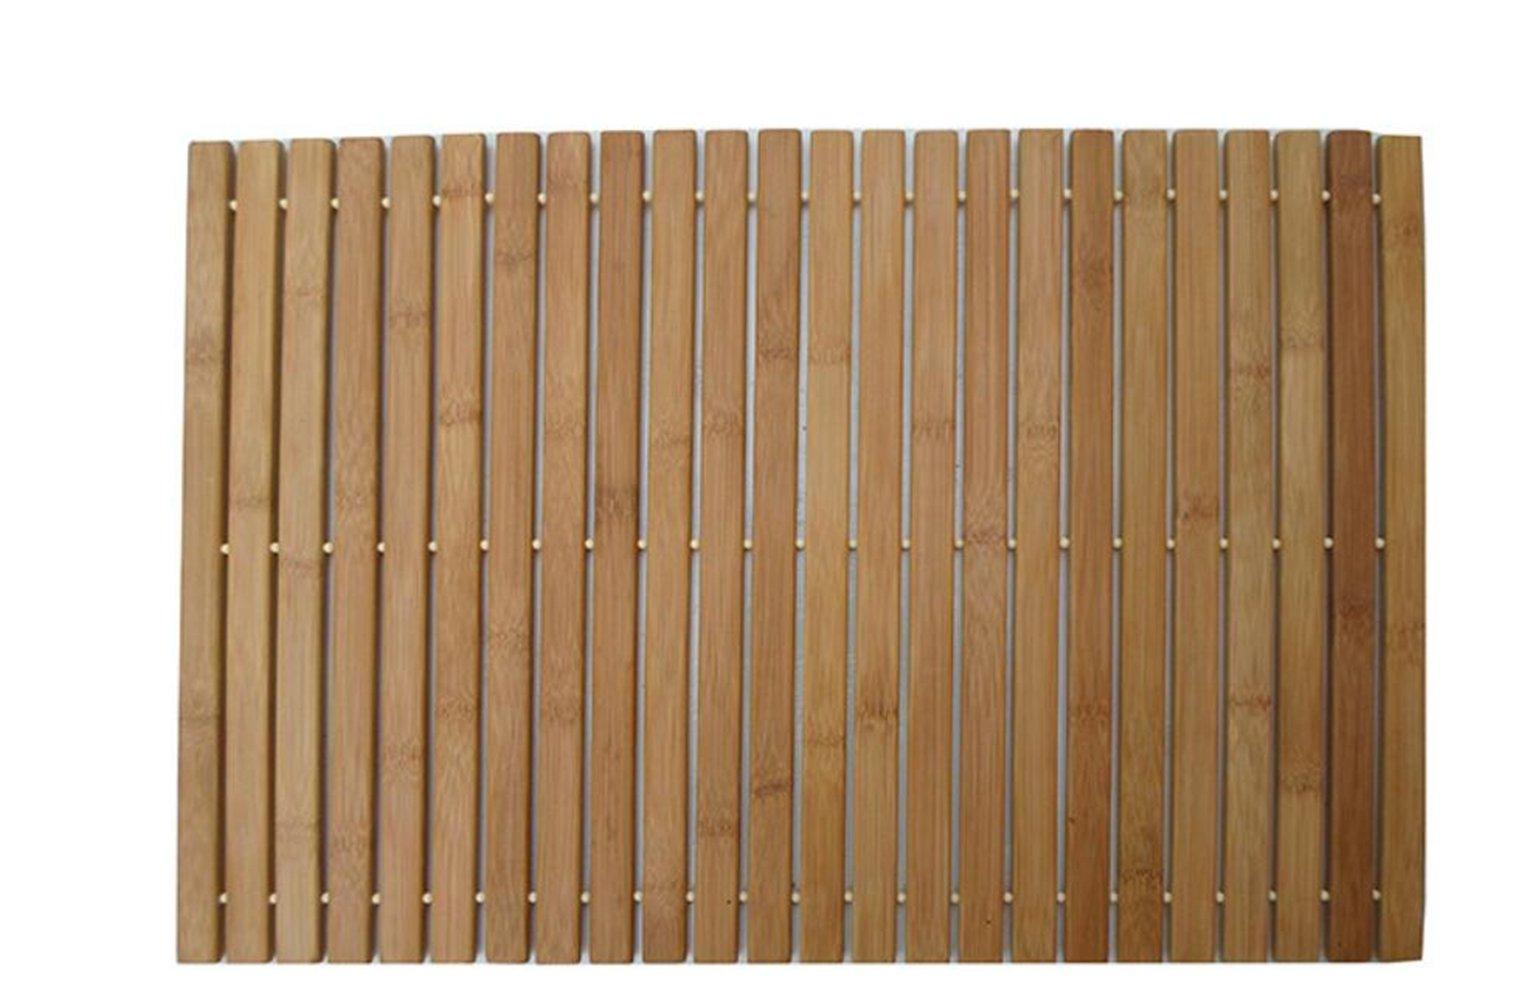 Univegrow Bathroom Bathtub Mat Foldable Bamboo Step Indoor/Outdoor Bath Shower and Floor Mat Non Slip Bottom Water Resistant Vented Design HomeToilet Spa Sauna Mat (L23.6 W15.7)